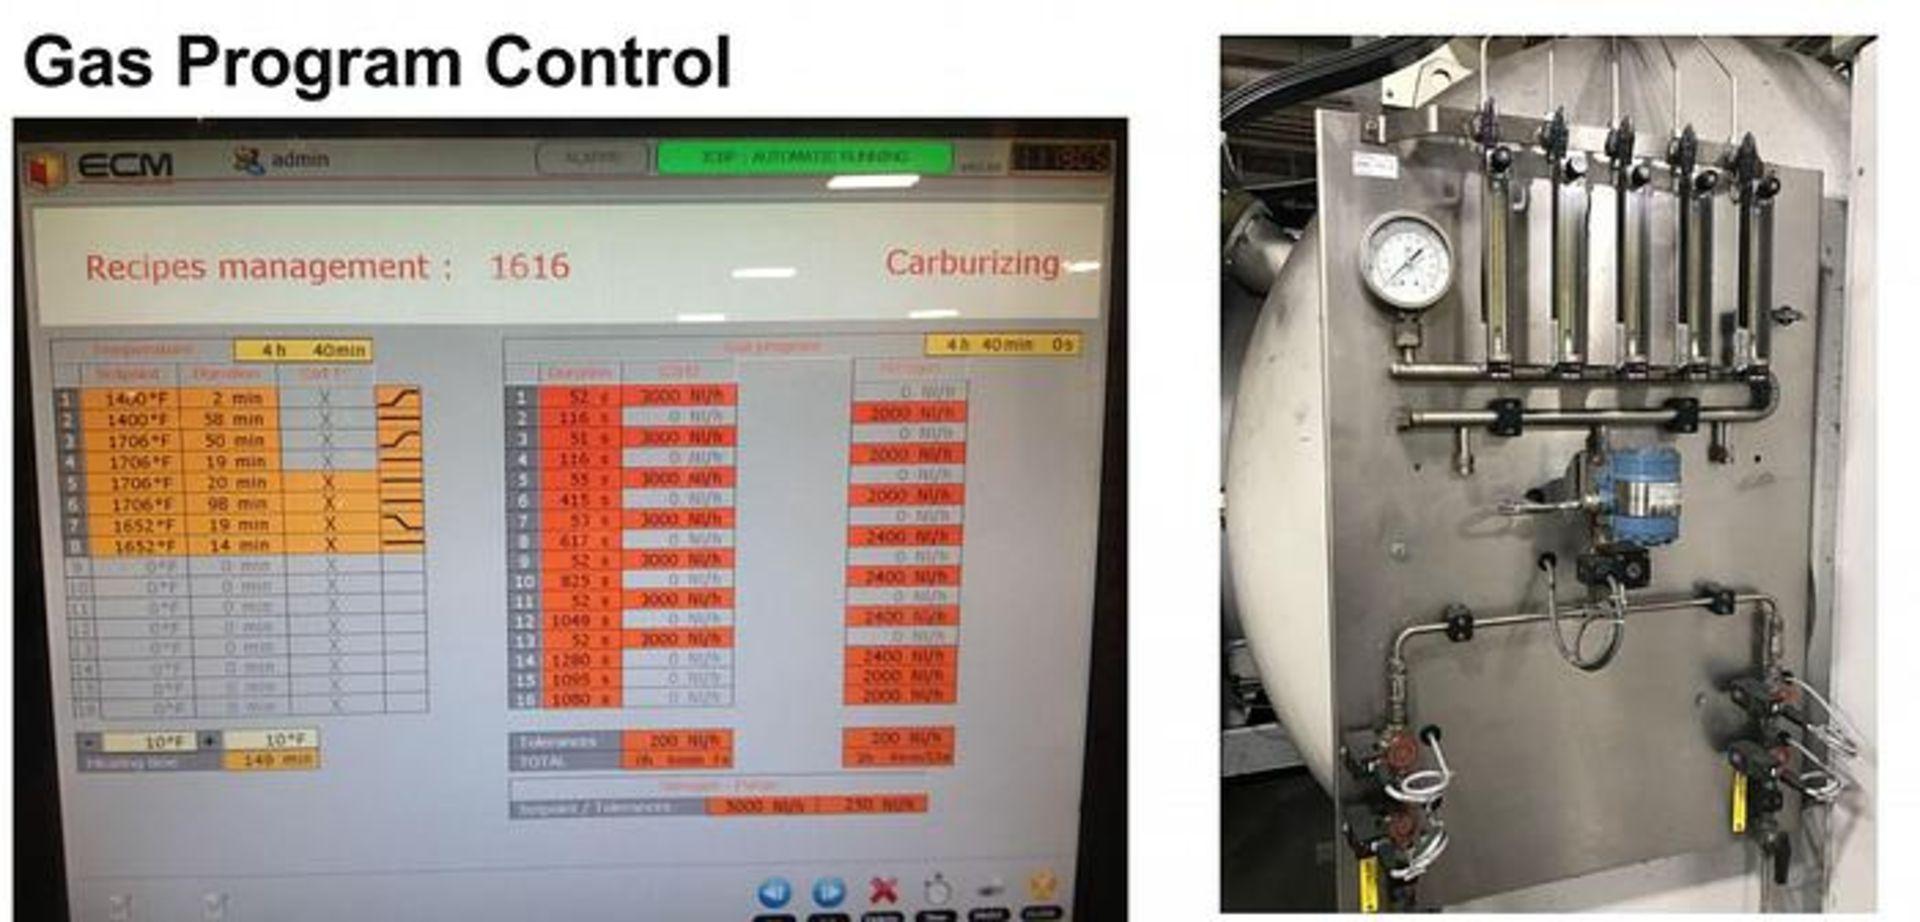 ECM TECHNOLOGIES VACUM CARBURIZING FURNACE, NEW 2013, SN 3100-500 - Image 10 of 50